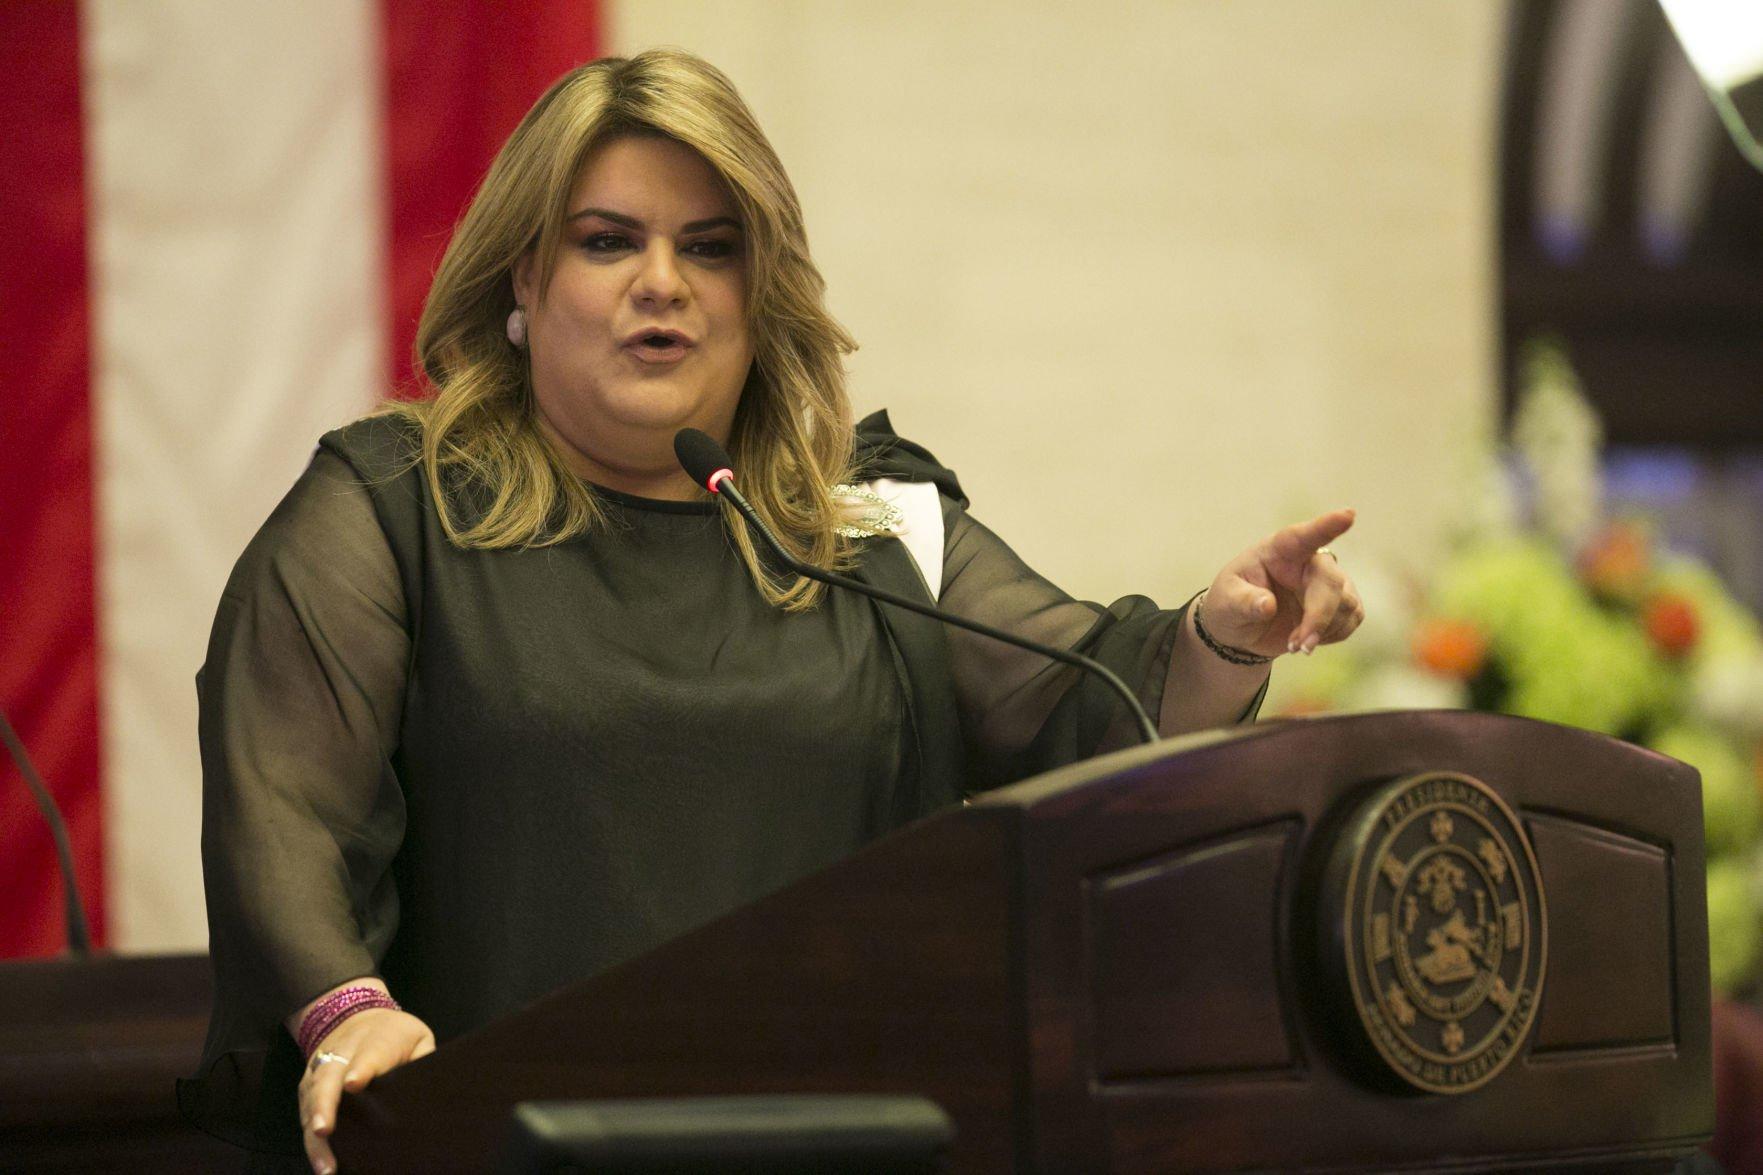 Jenniffer González pide a Rosselló salga de la presidencia del PNP